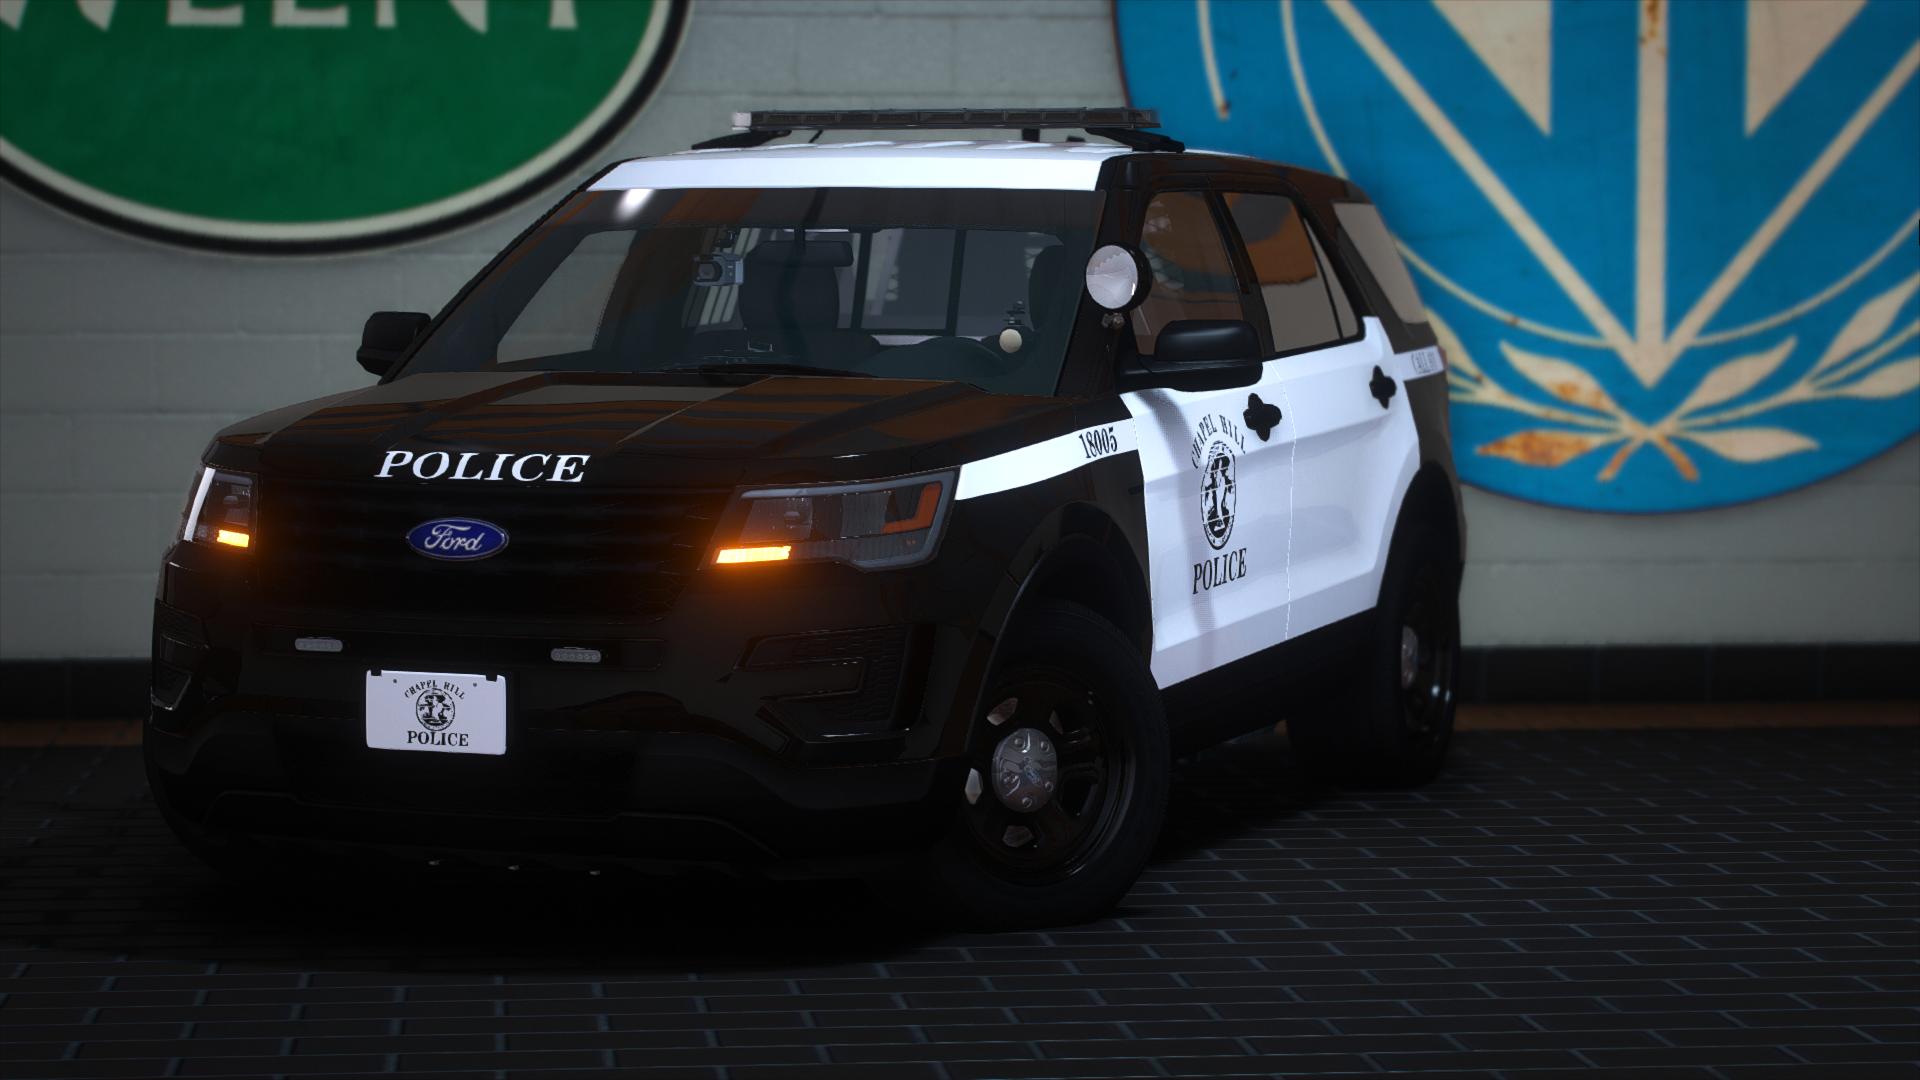 Grand_Theft_Auto_V_Screenshot_2021.08.02_-_04.15.57.52.png